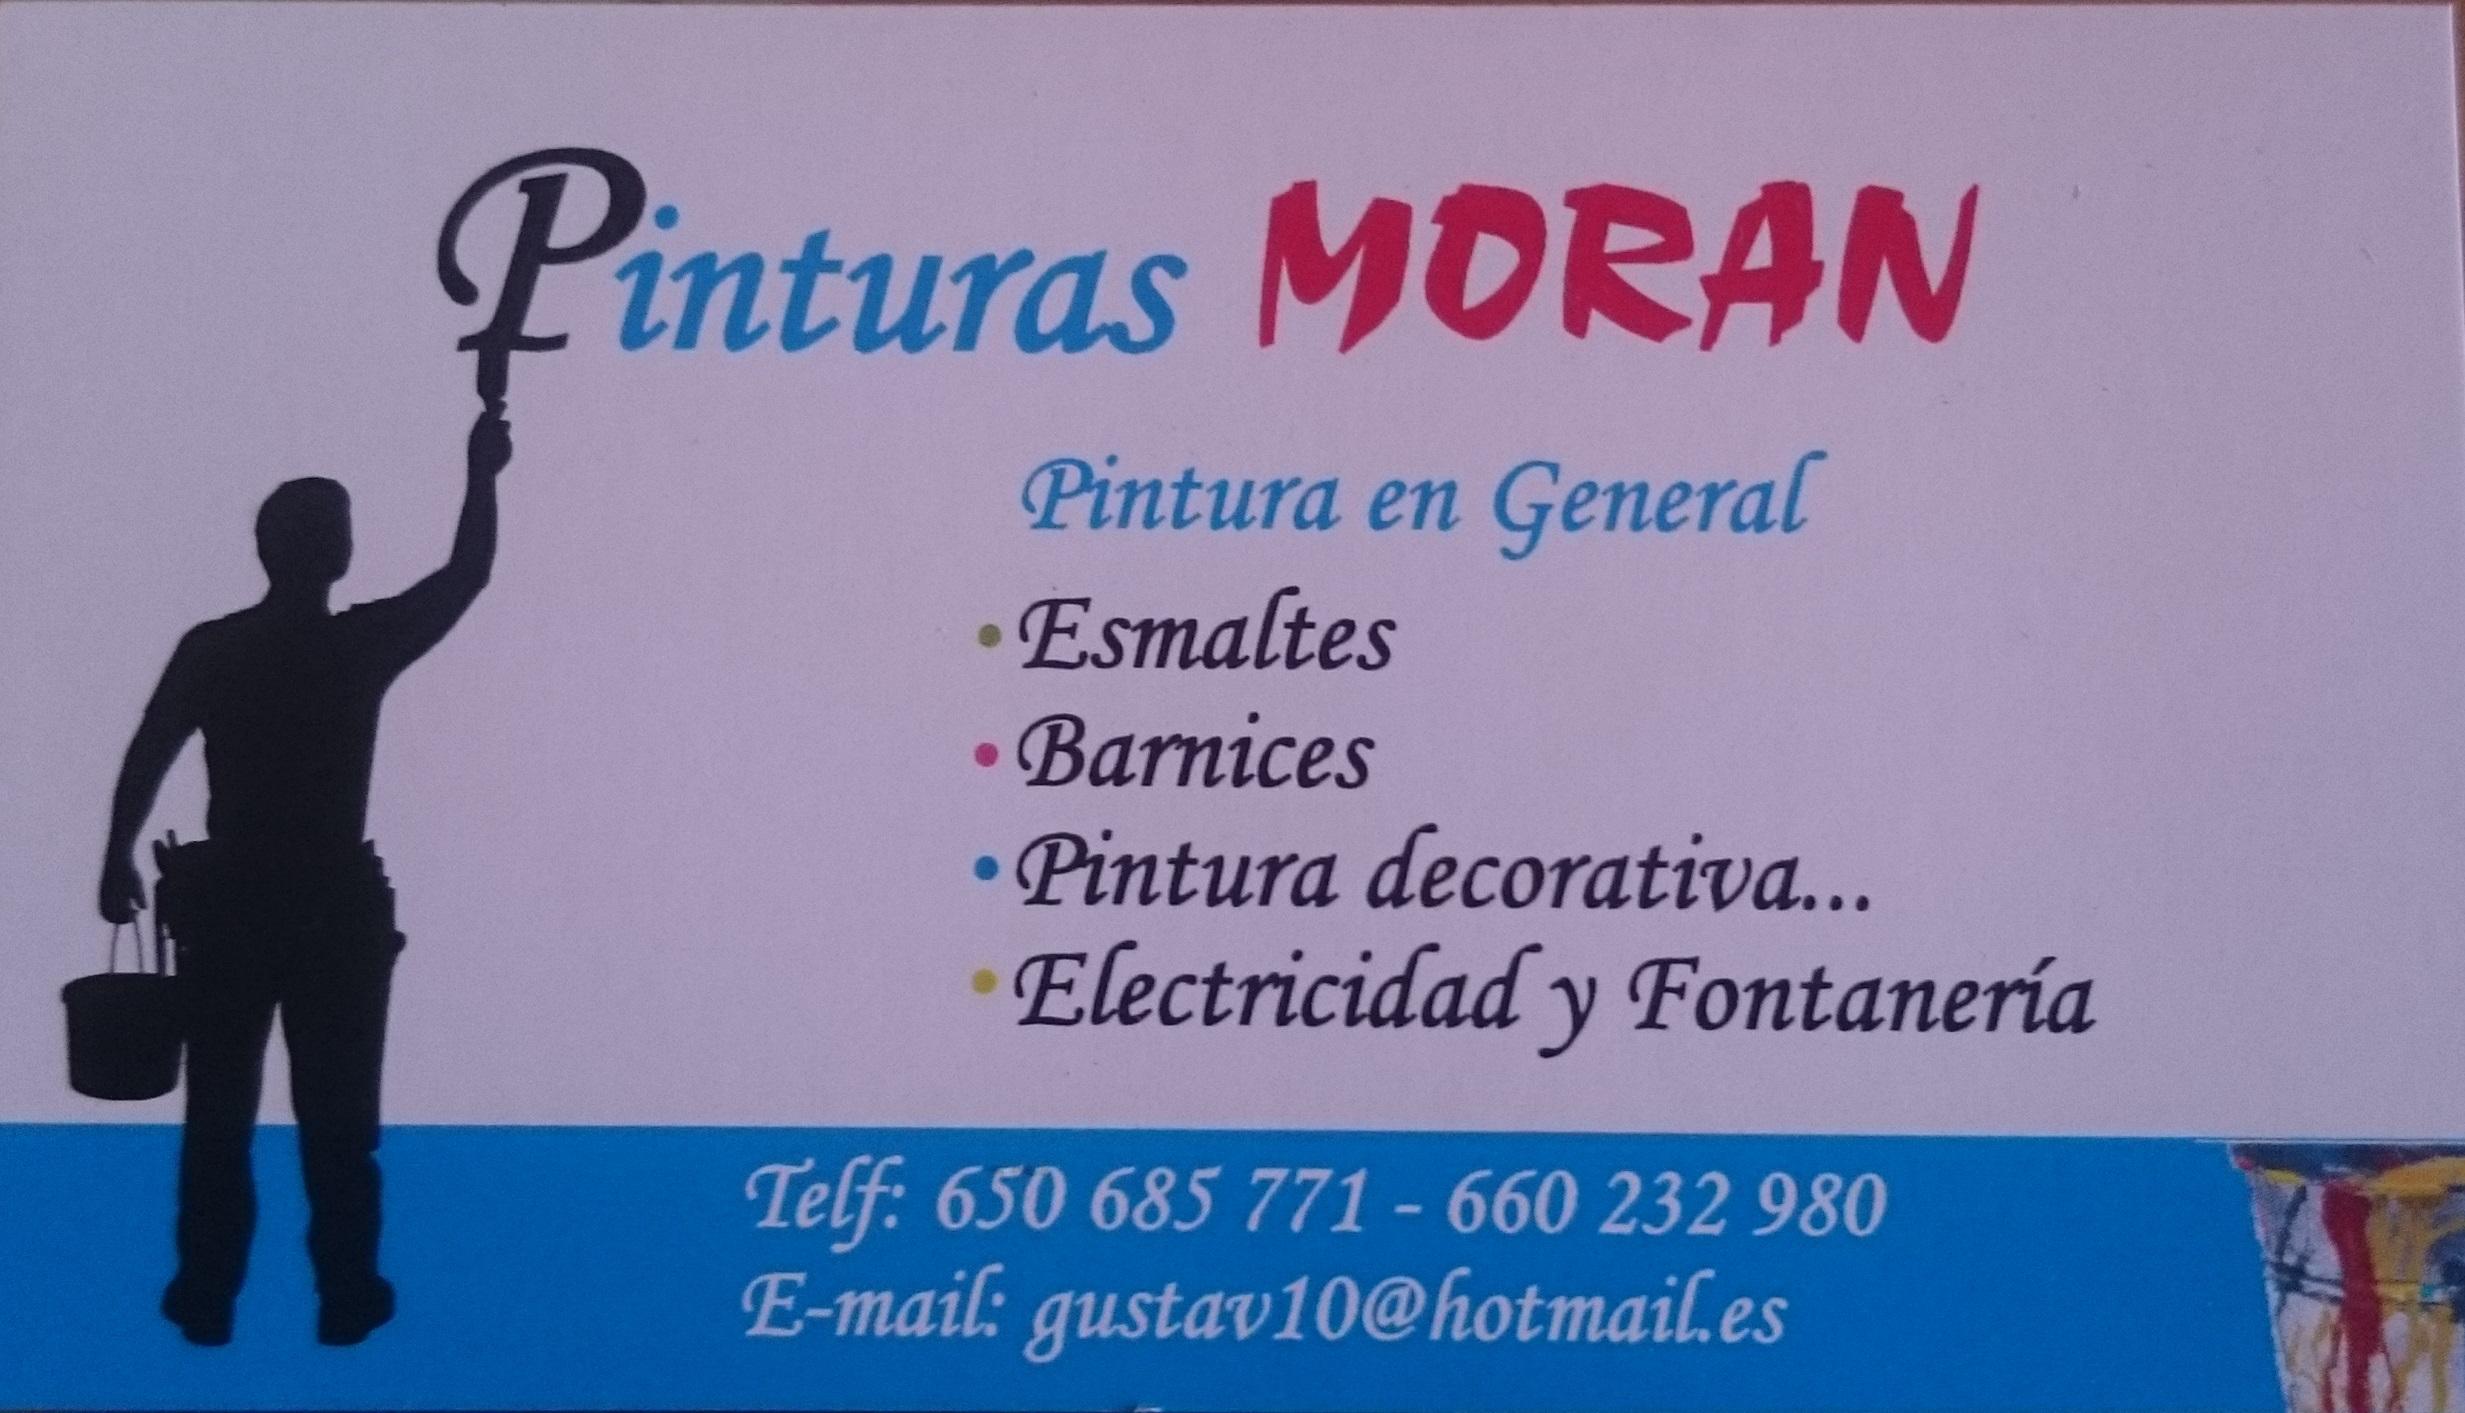 Gustavo Moran San Lucas